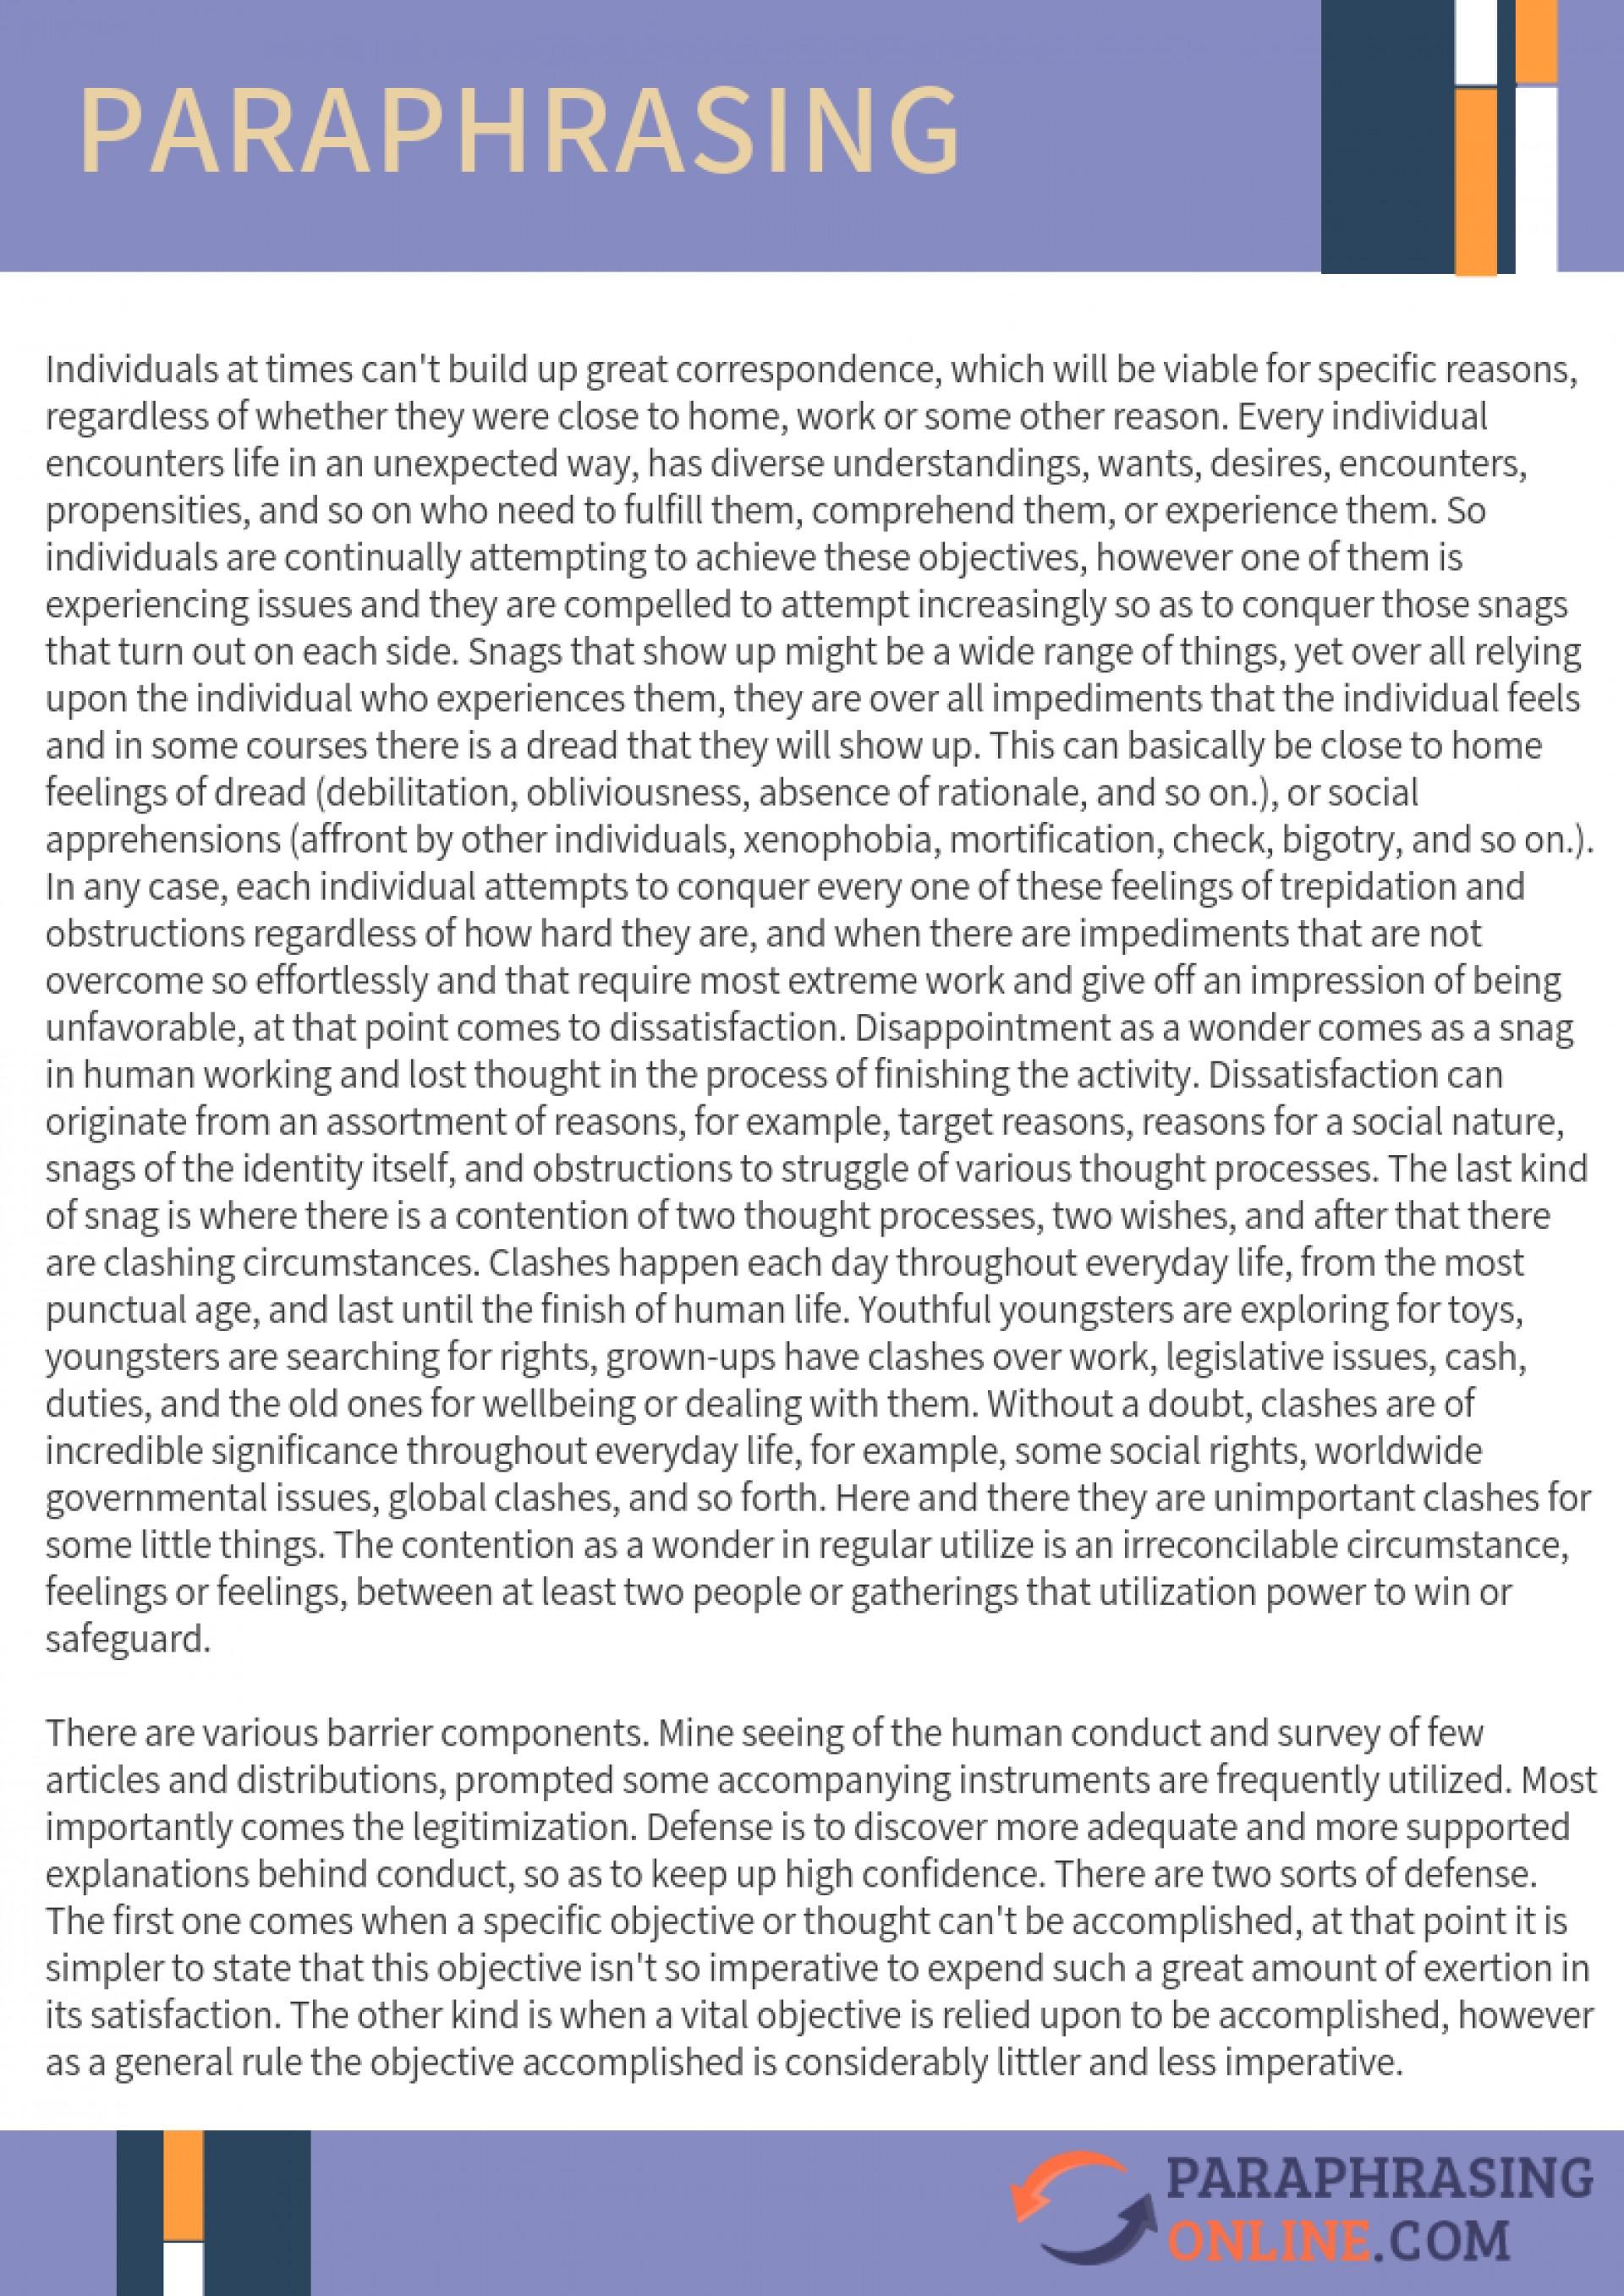 005 Rewrite Essay Example Paraphrasing Best Software Article Freelance 1920